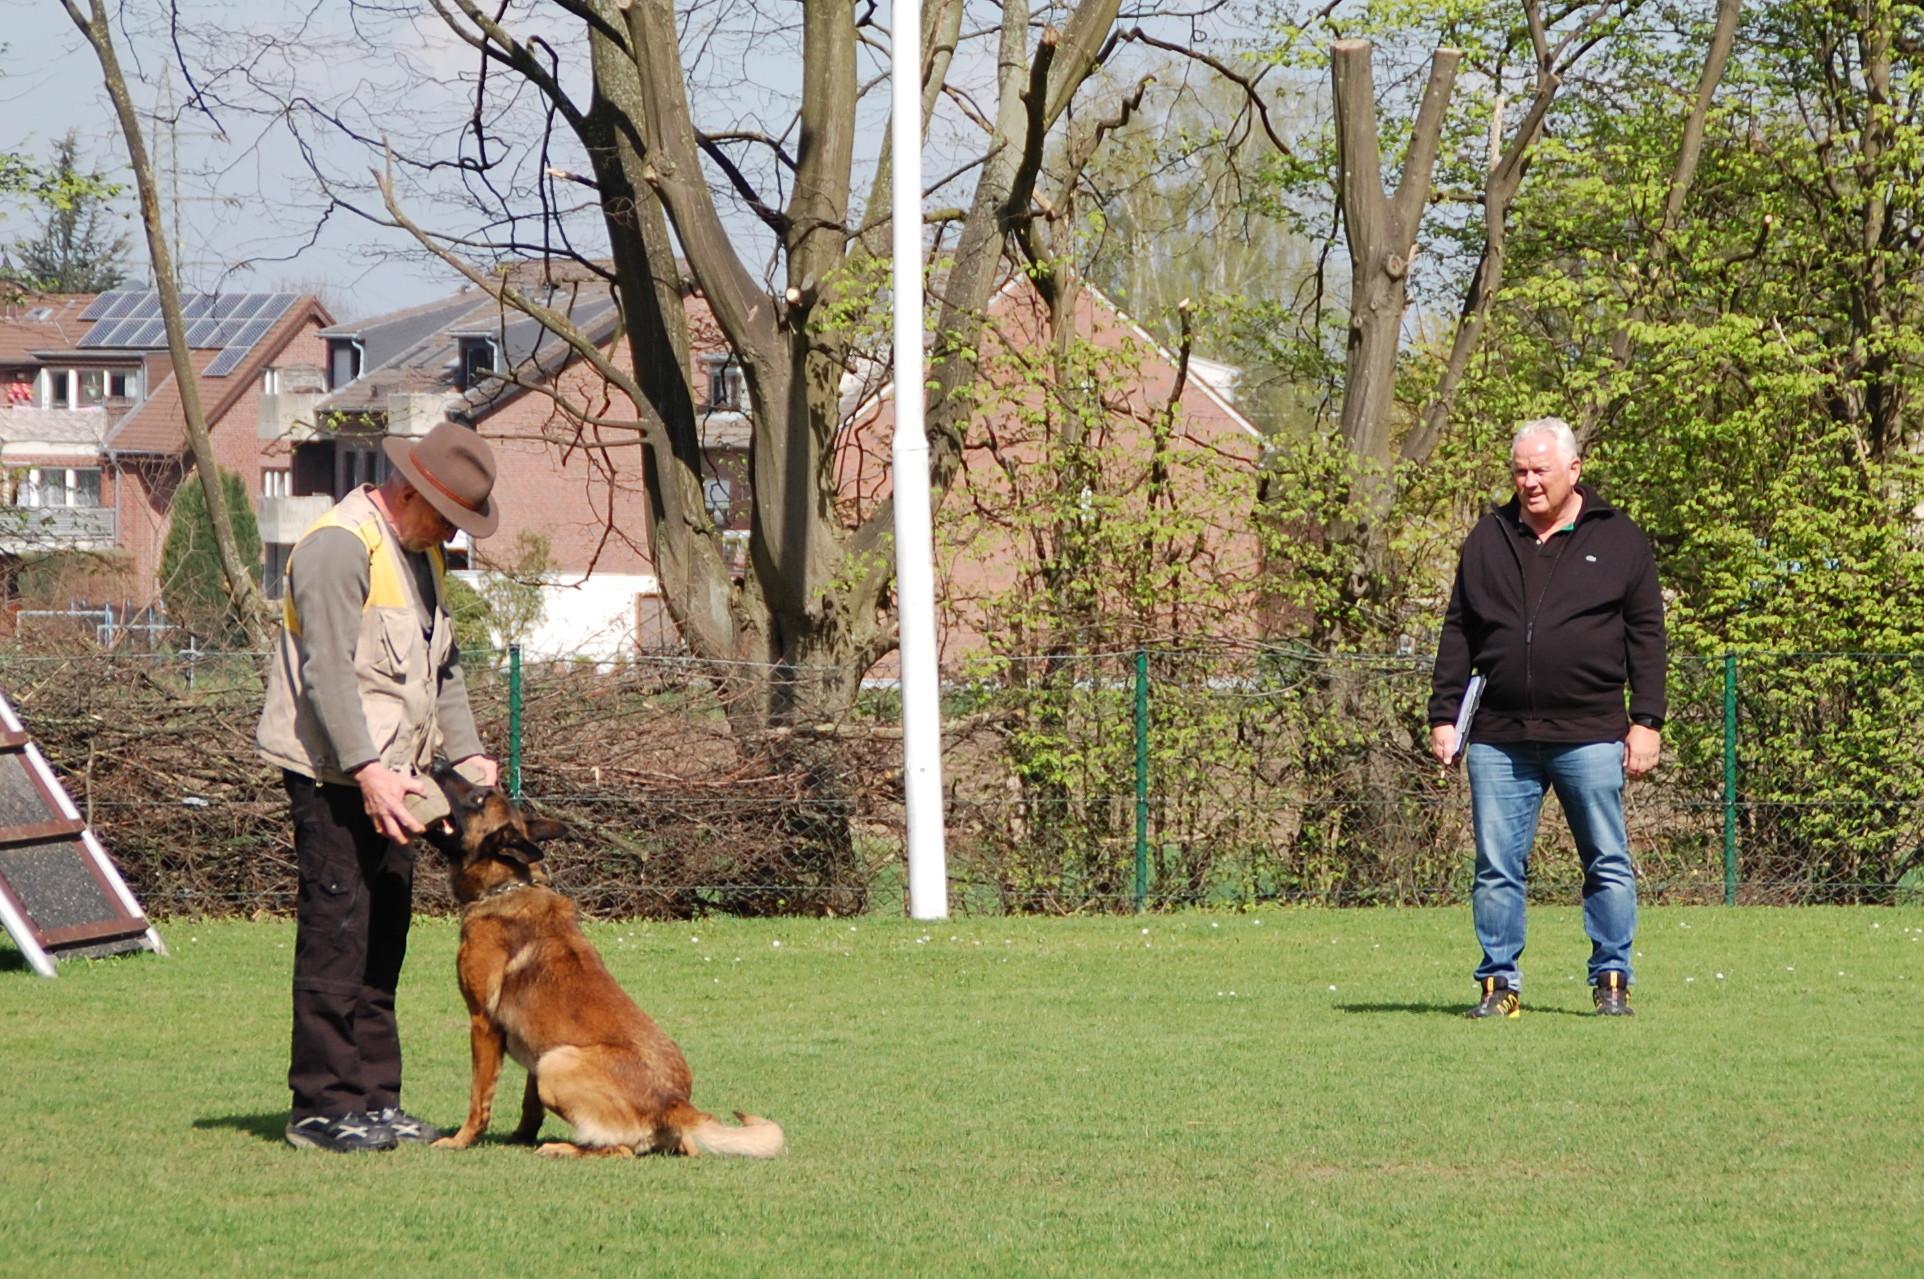 Drago bringt Hermann Padrock das Apportierholz